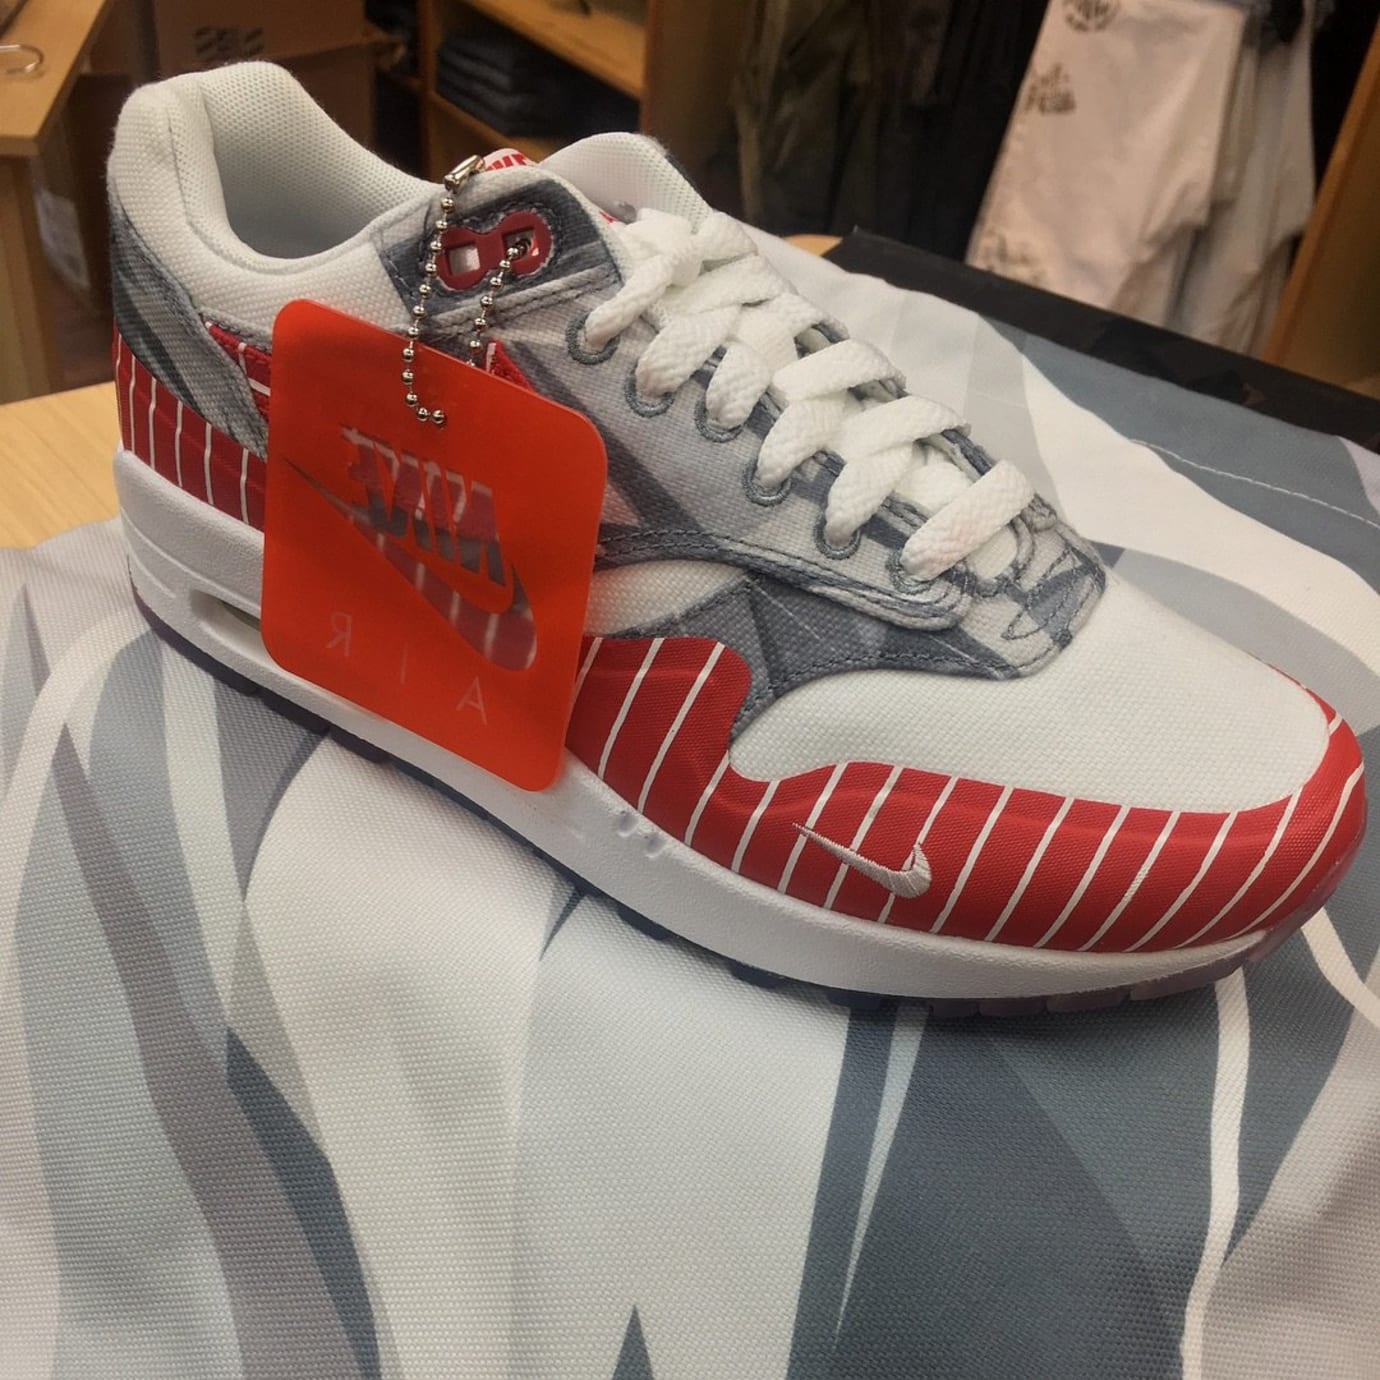 Nike Air Max 1 Los Primeros Hispanic Heritage Month Release Date (1)